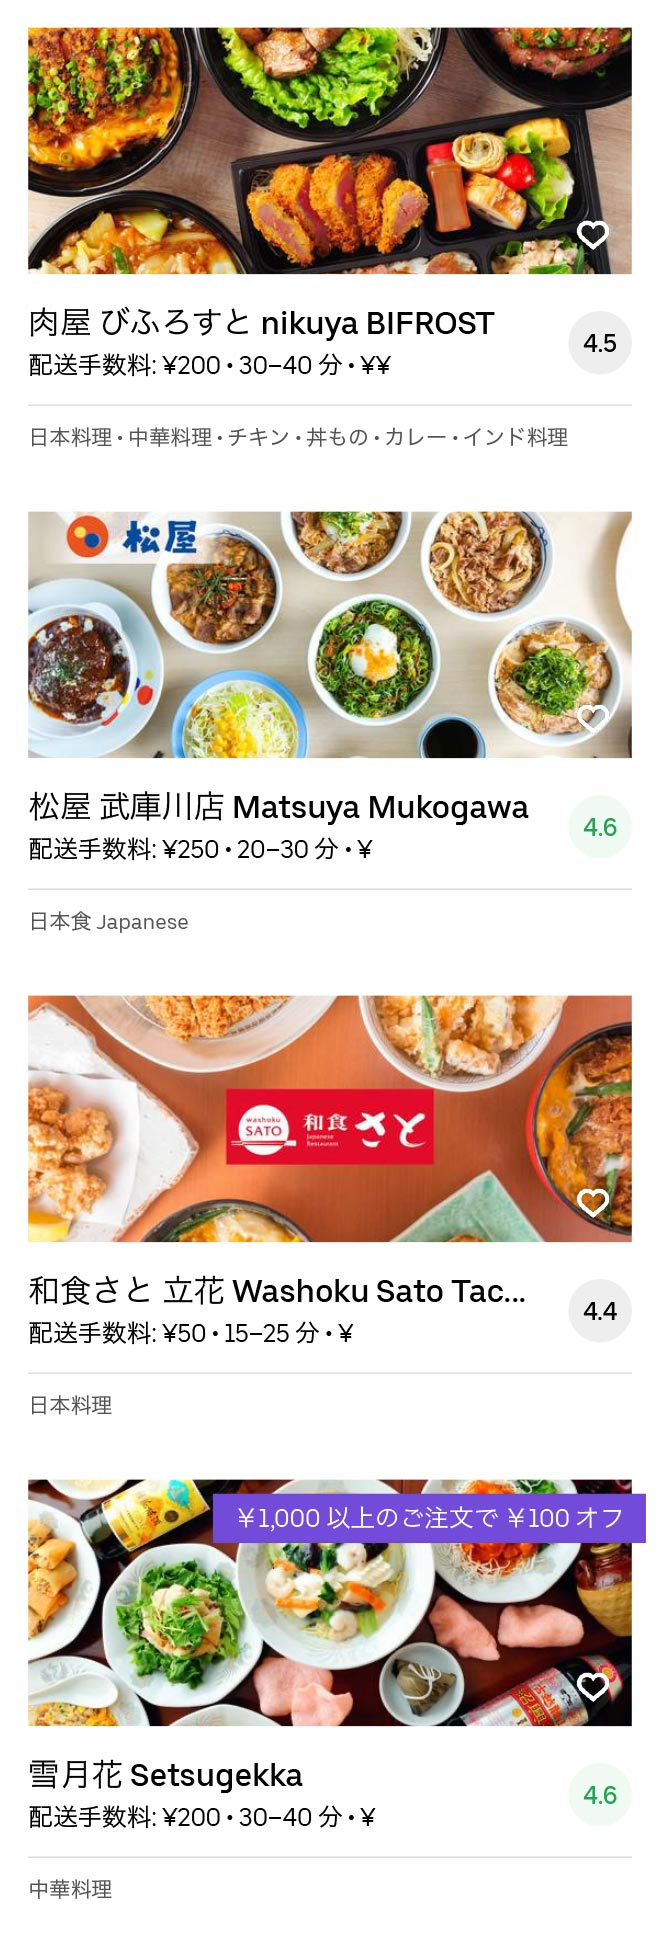 Amagasaki mukonosou menu 2005 09